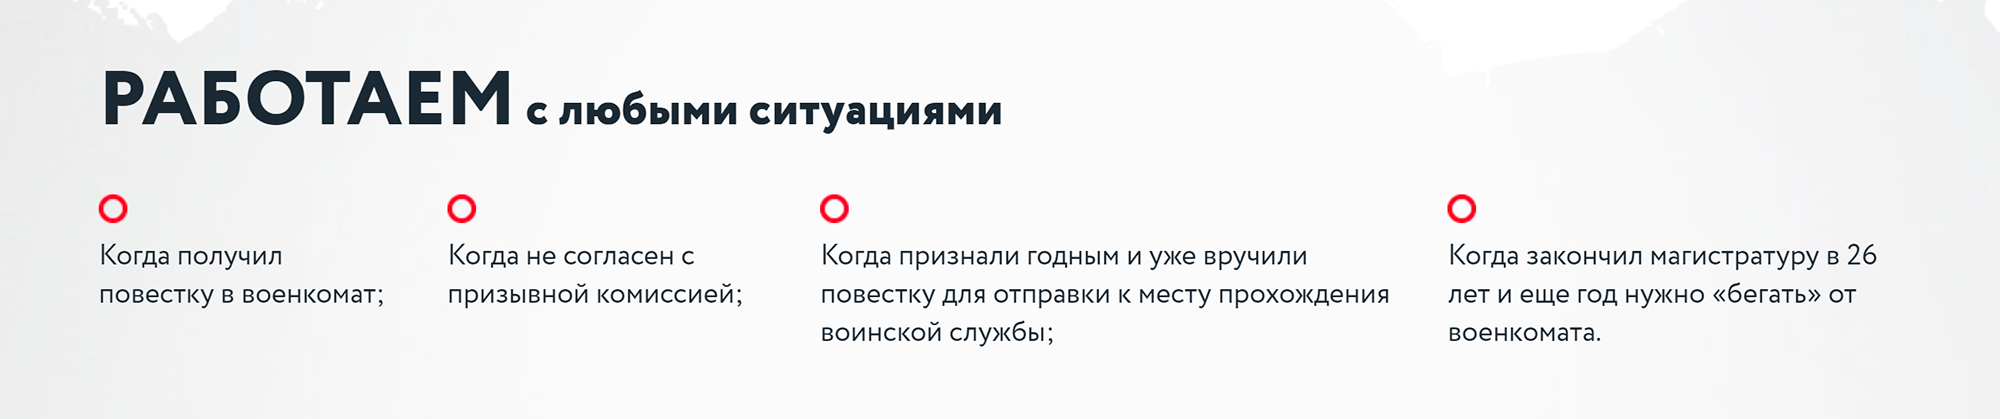 prizyvanet.ru